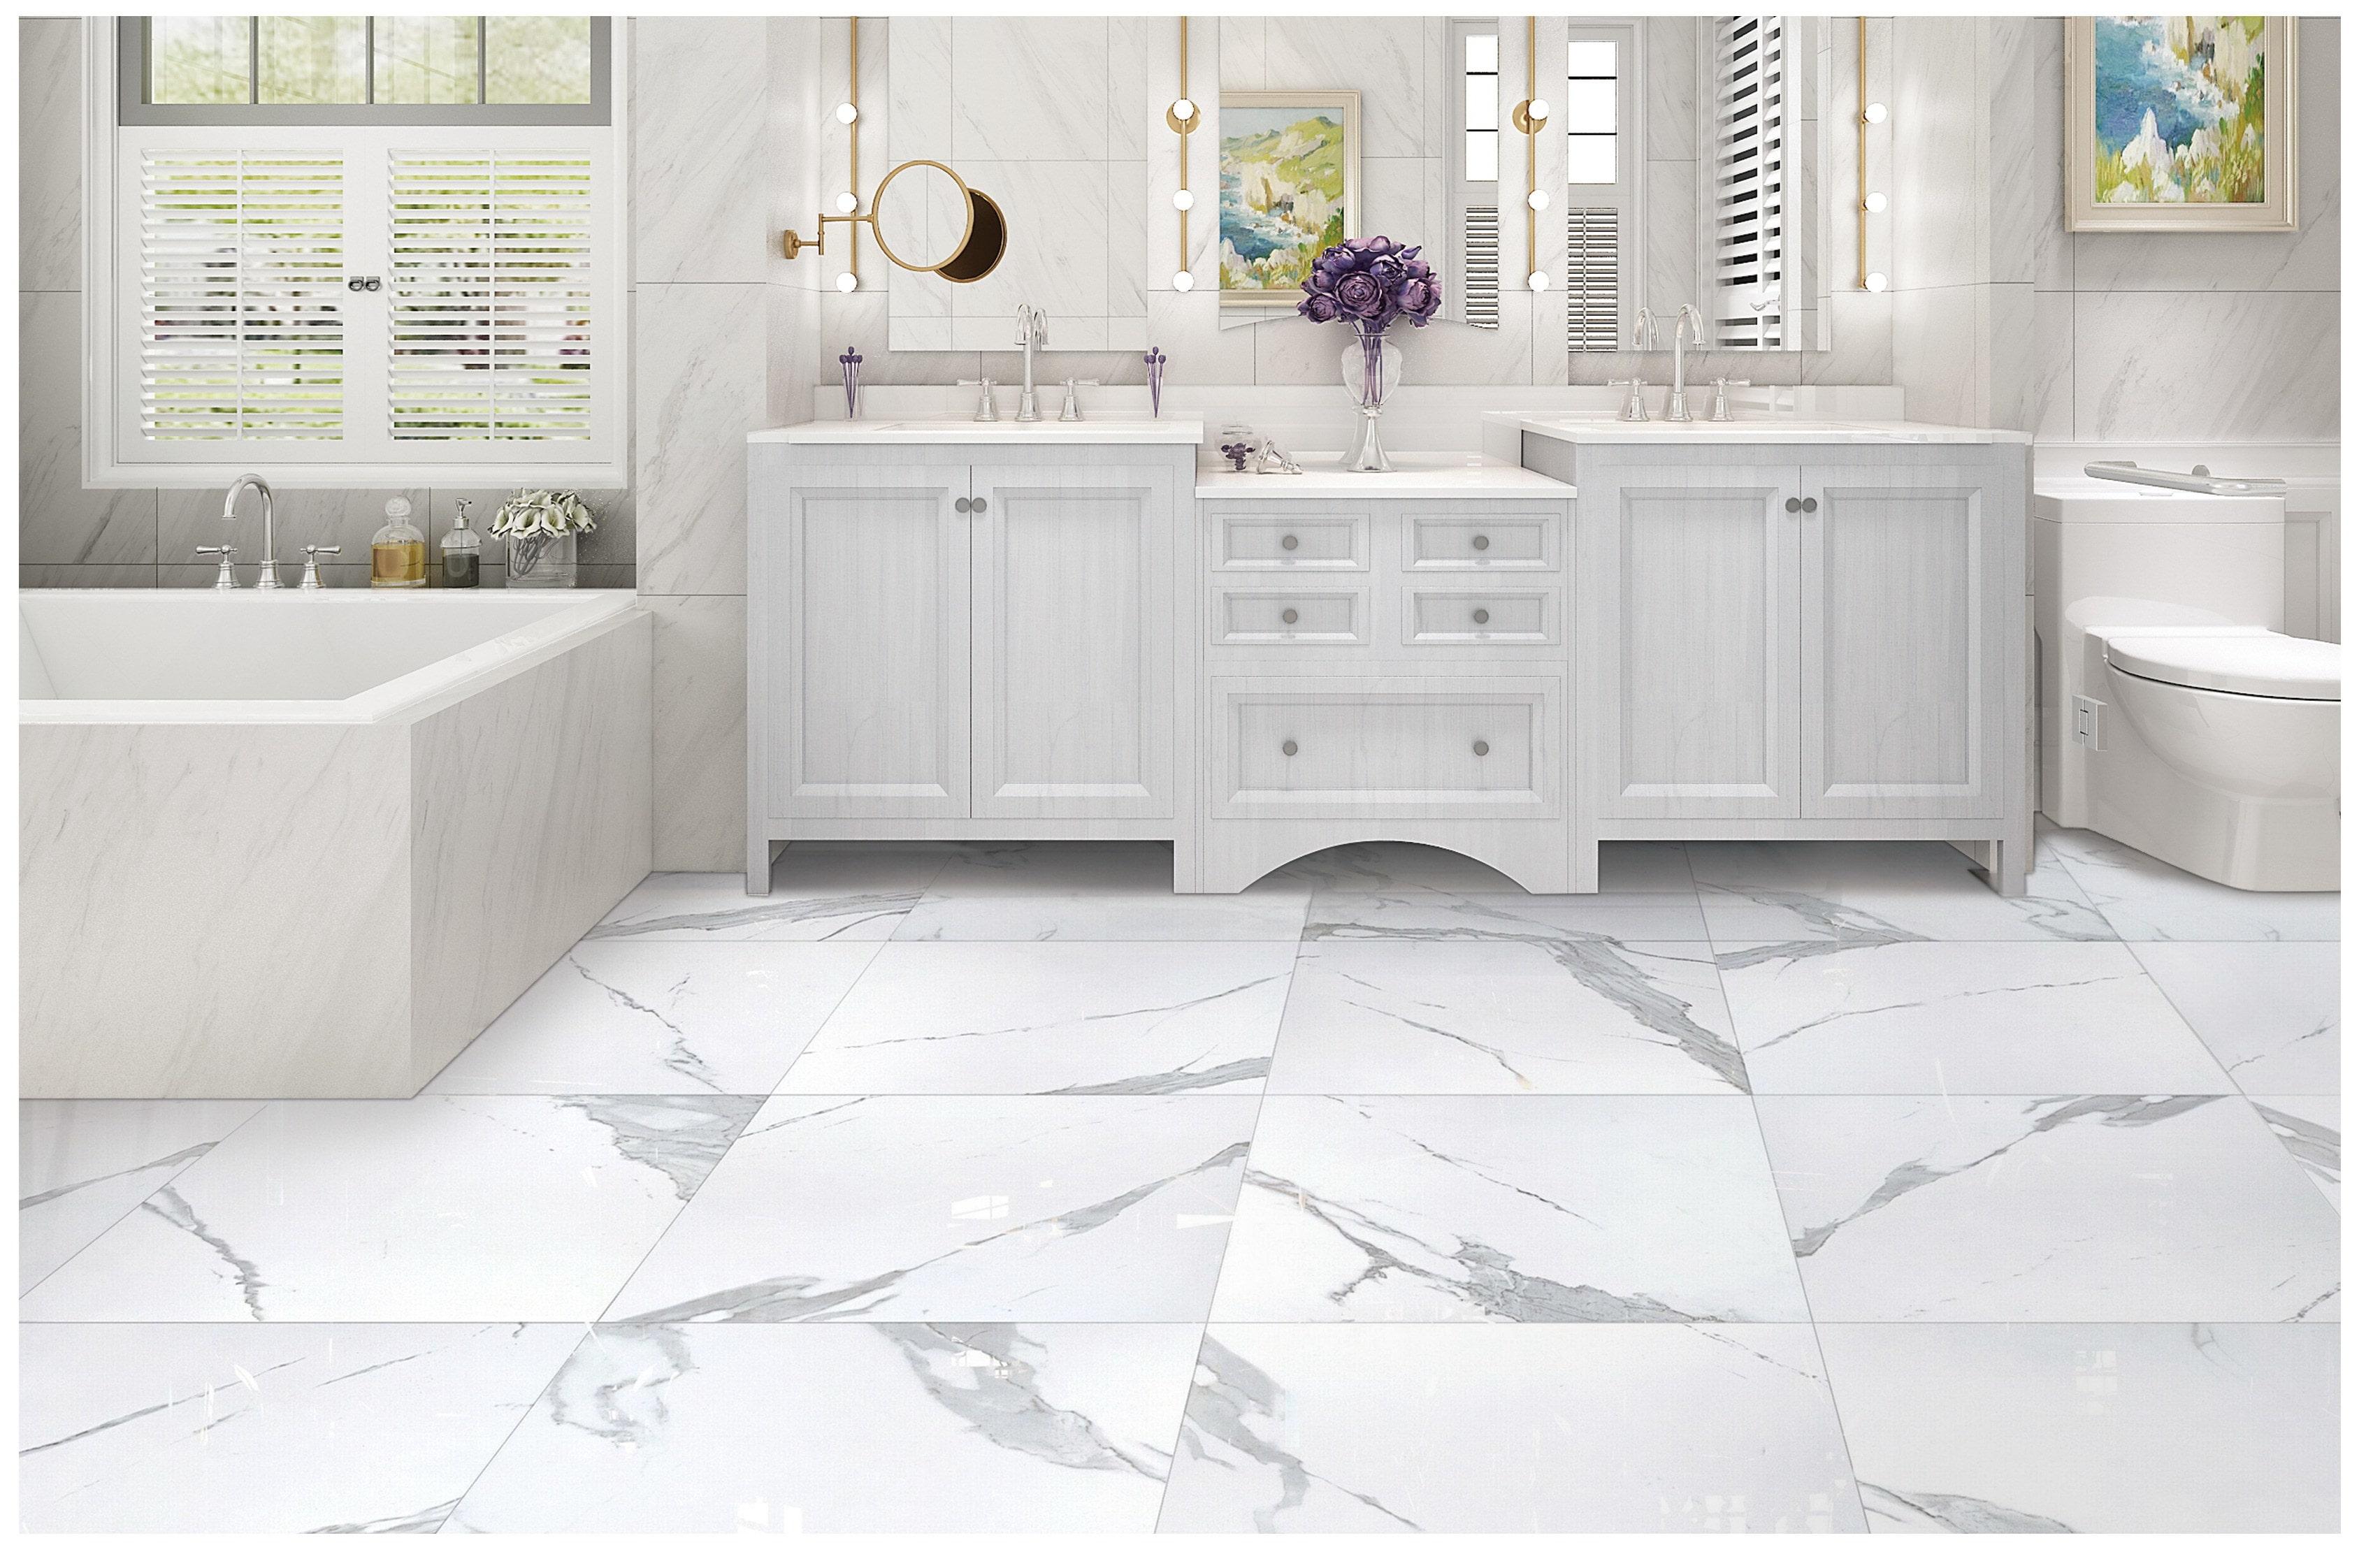 Salerno Porcelain Tile - Calacatta Marble Series Calacatta / 12\